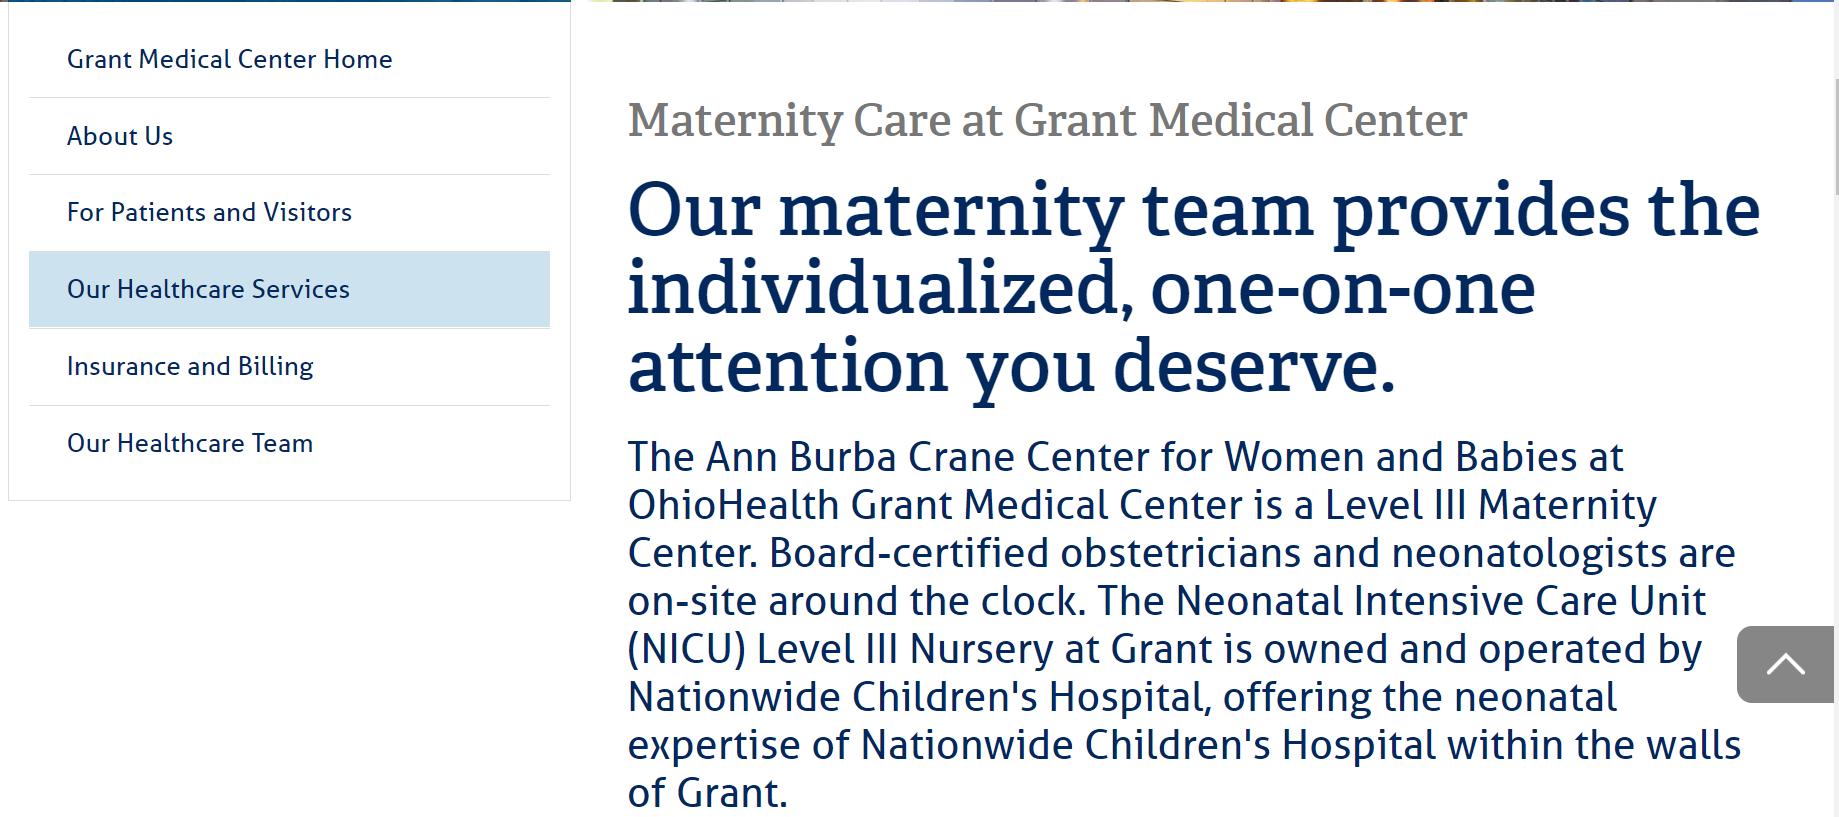 Frontrunner in providing quality maternal care